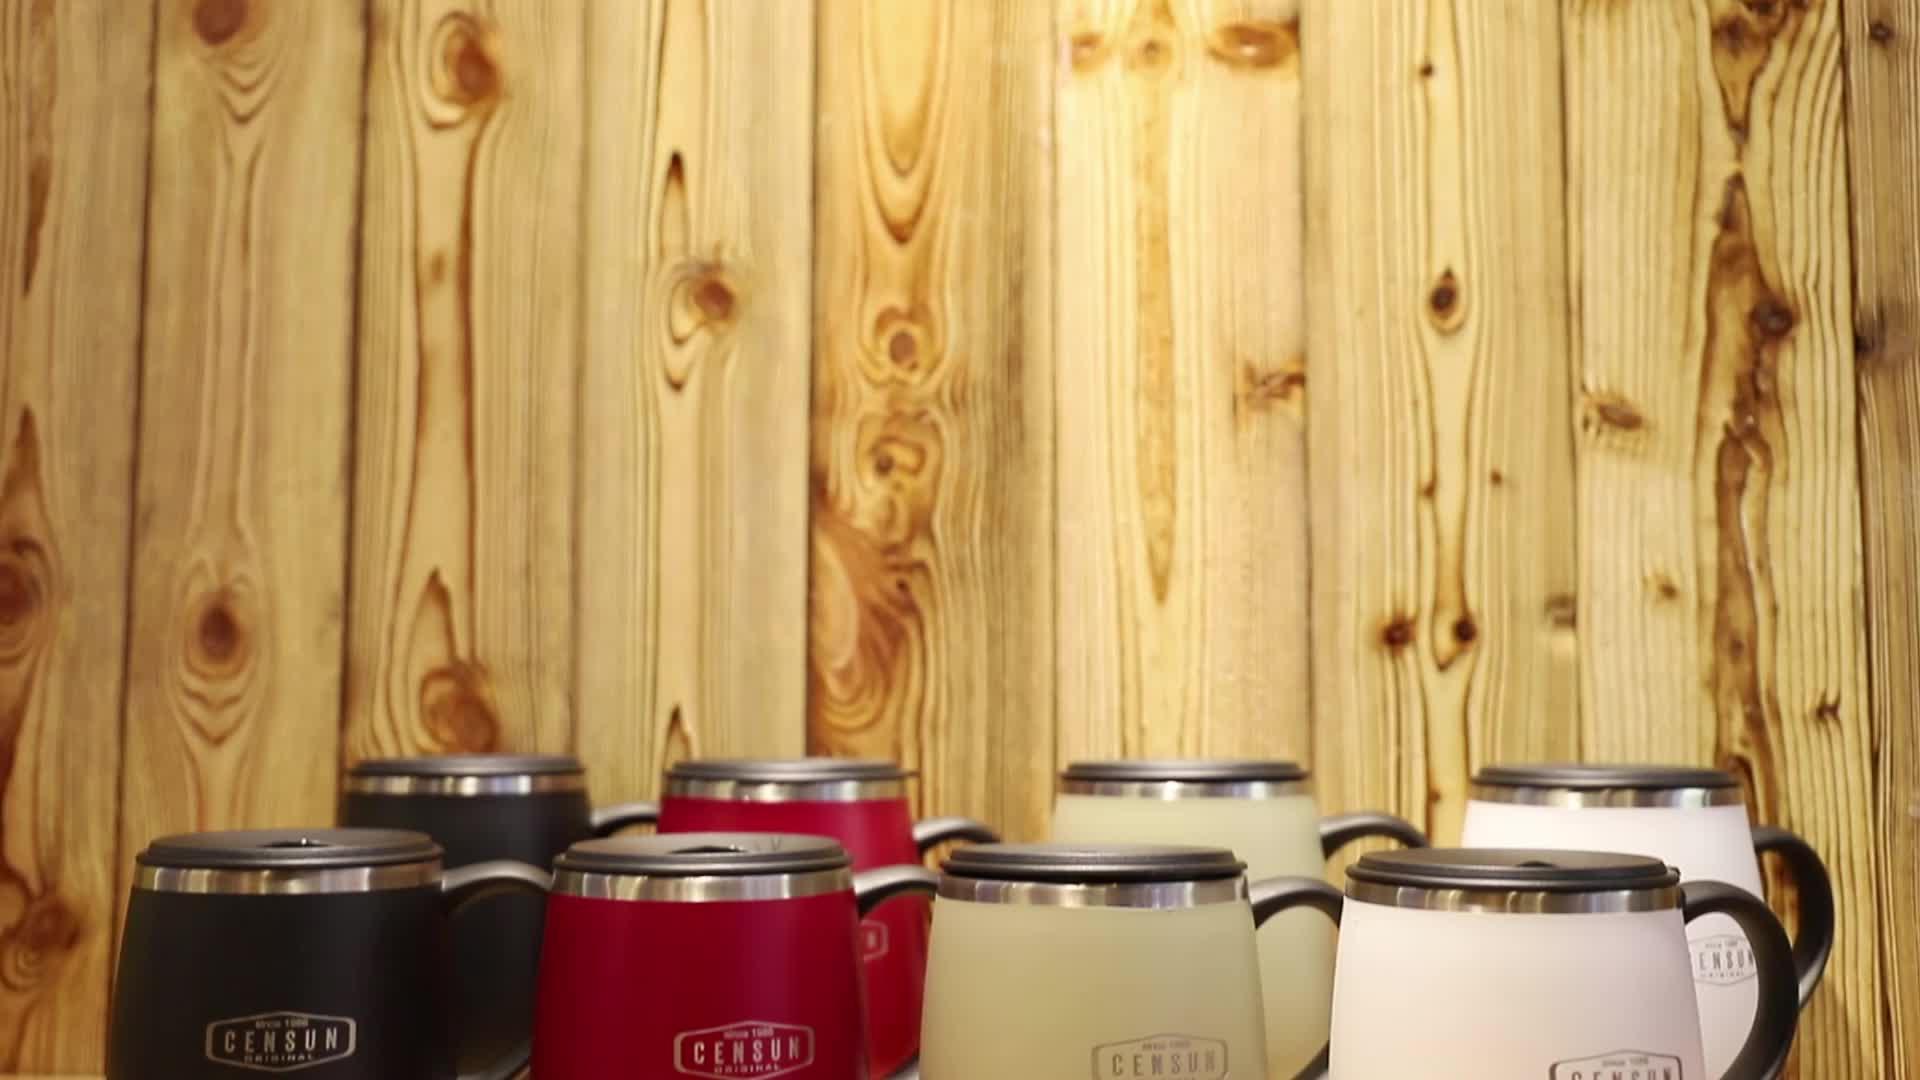 Hot Sale Stainless Steel Insulated Mug with Lid Handle Coffee Mug Travel Tumbler